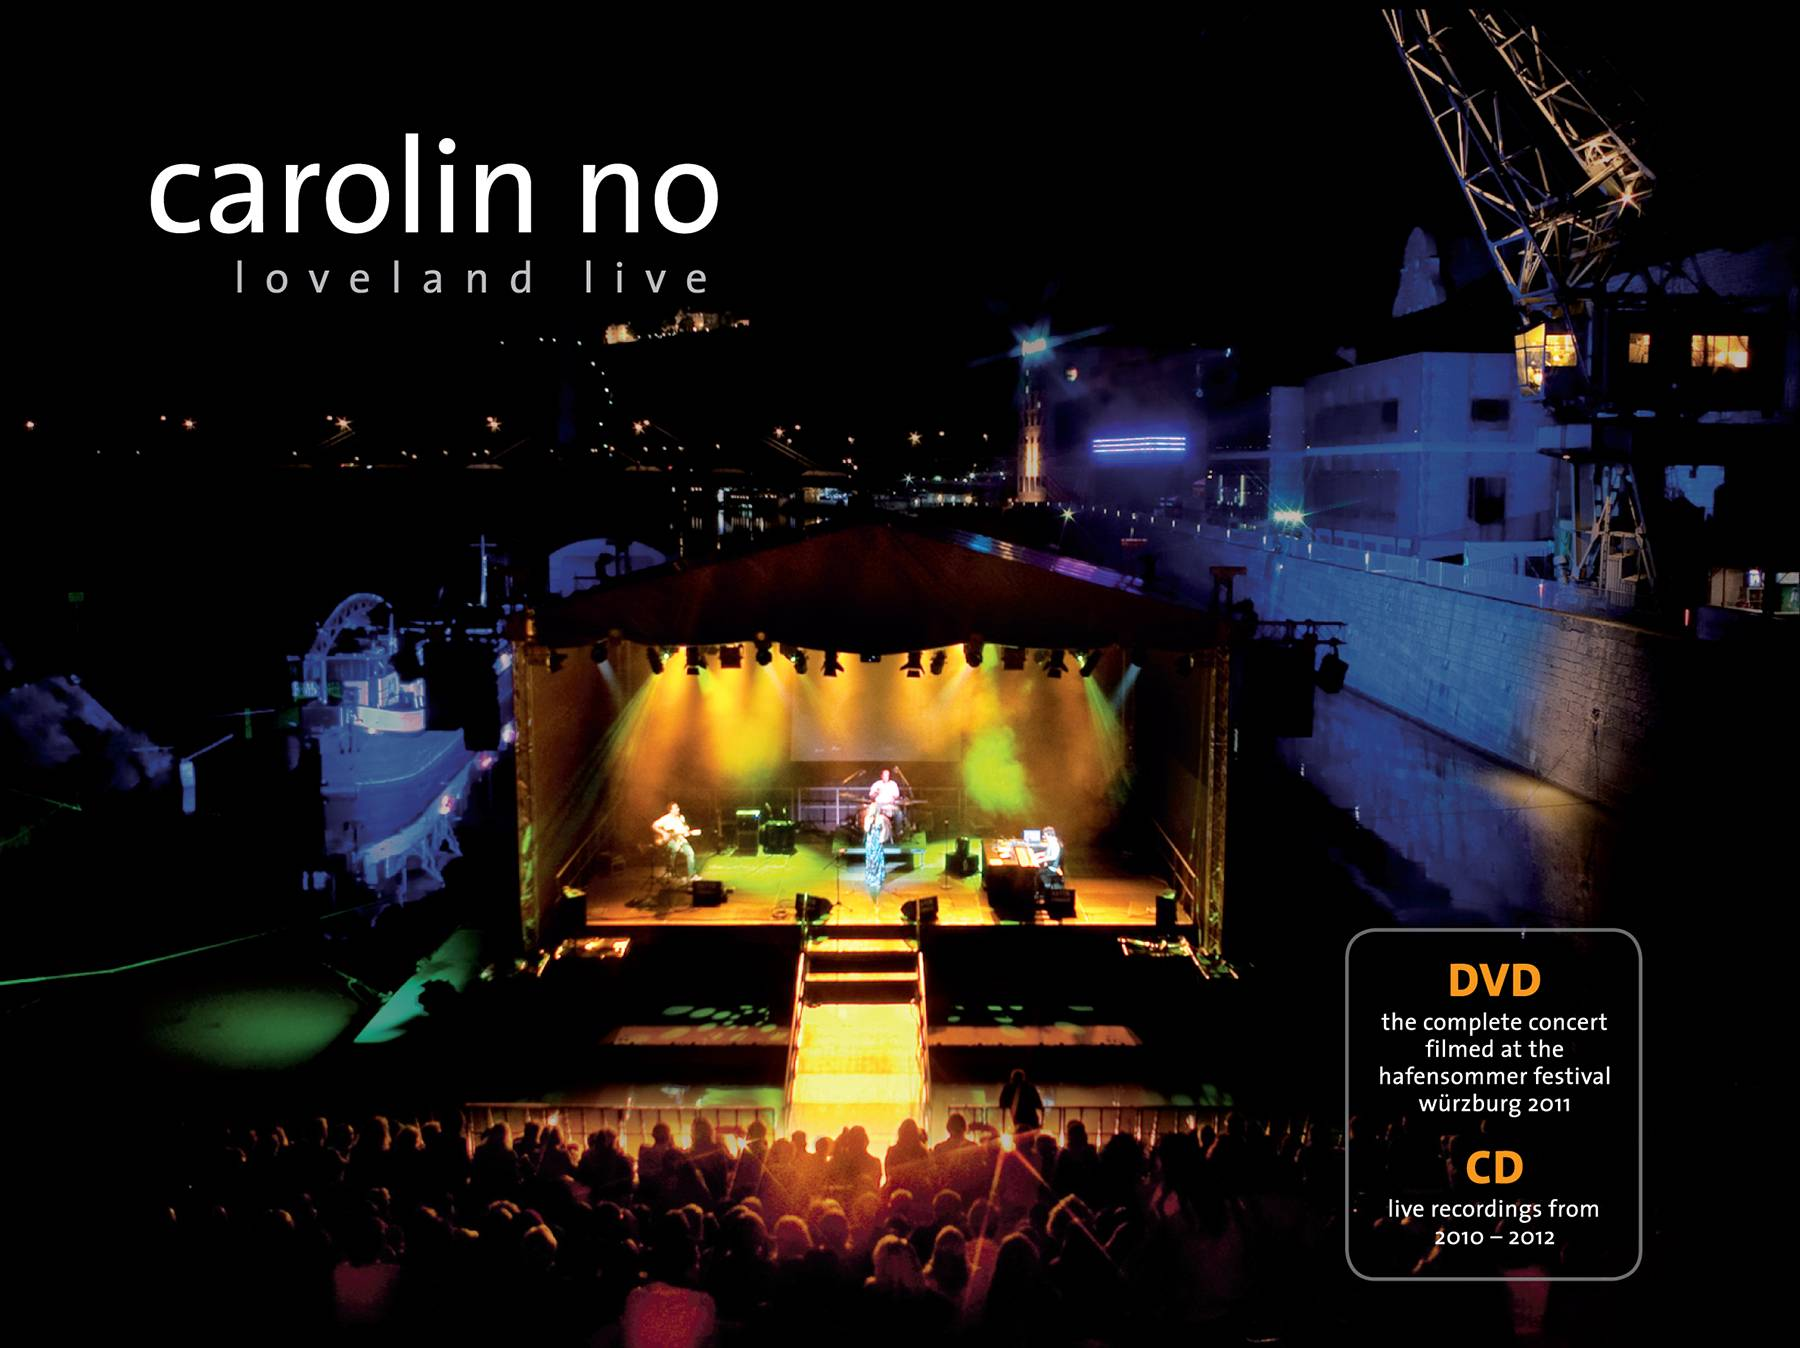 Carolin No Loveland live